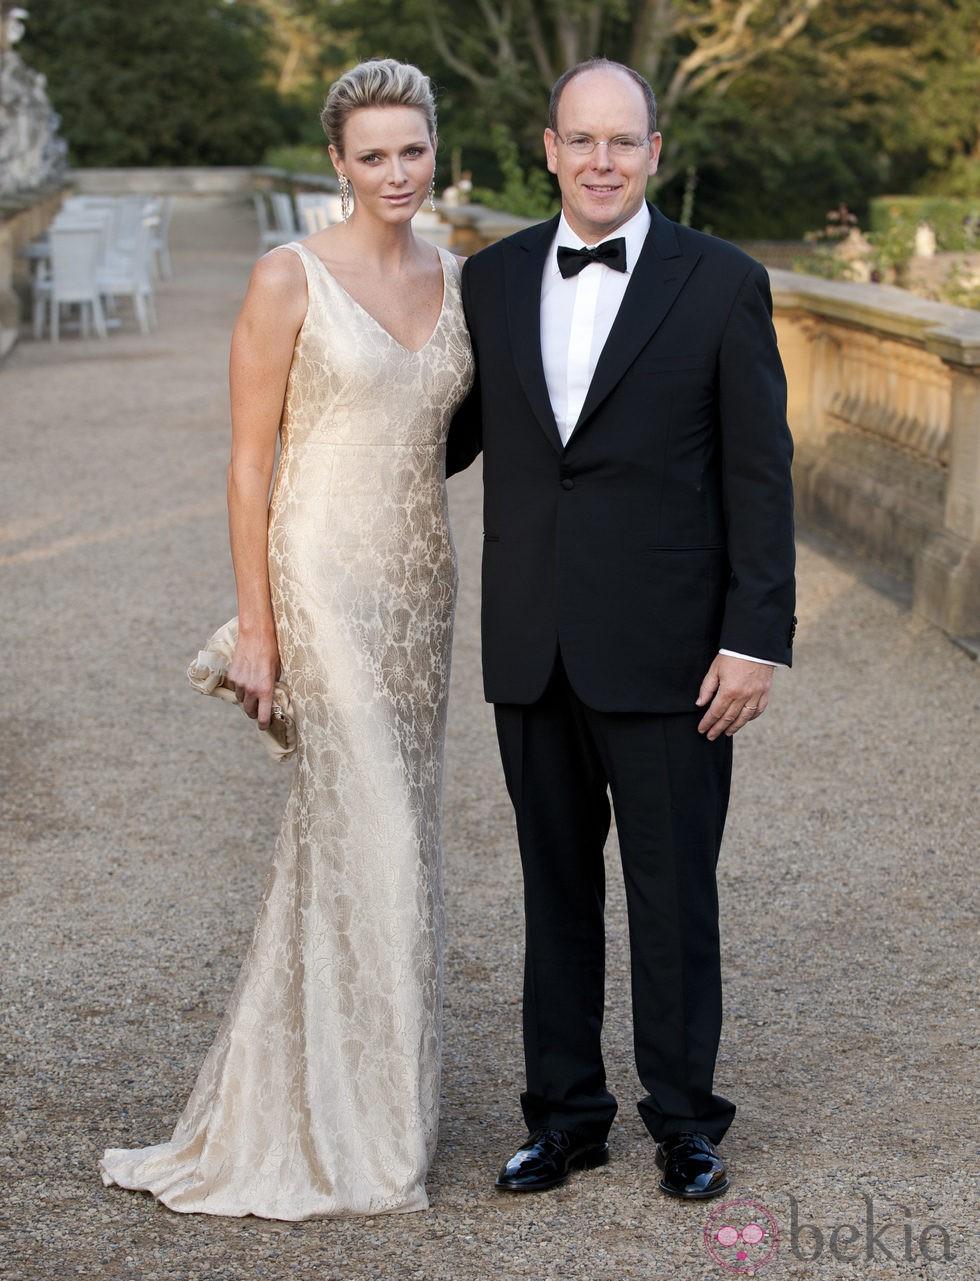 Alberto de Mónaco y Charlene Wittstock en una gala benéfica celebrada en Inglaterra